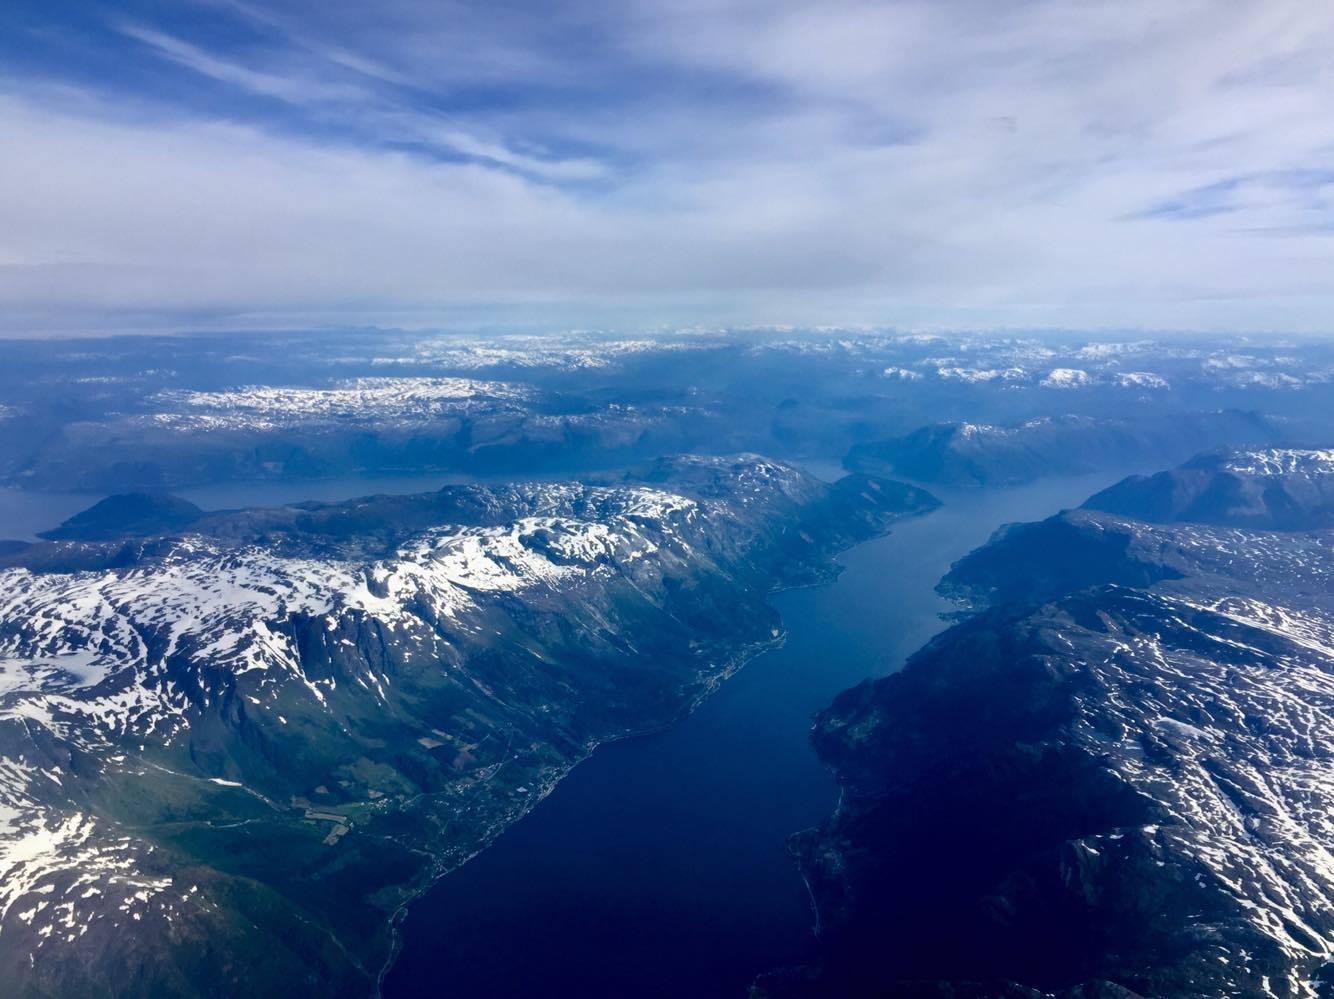 vany visits_bergen